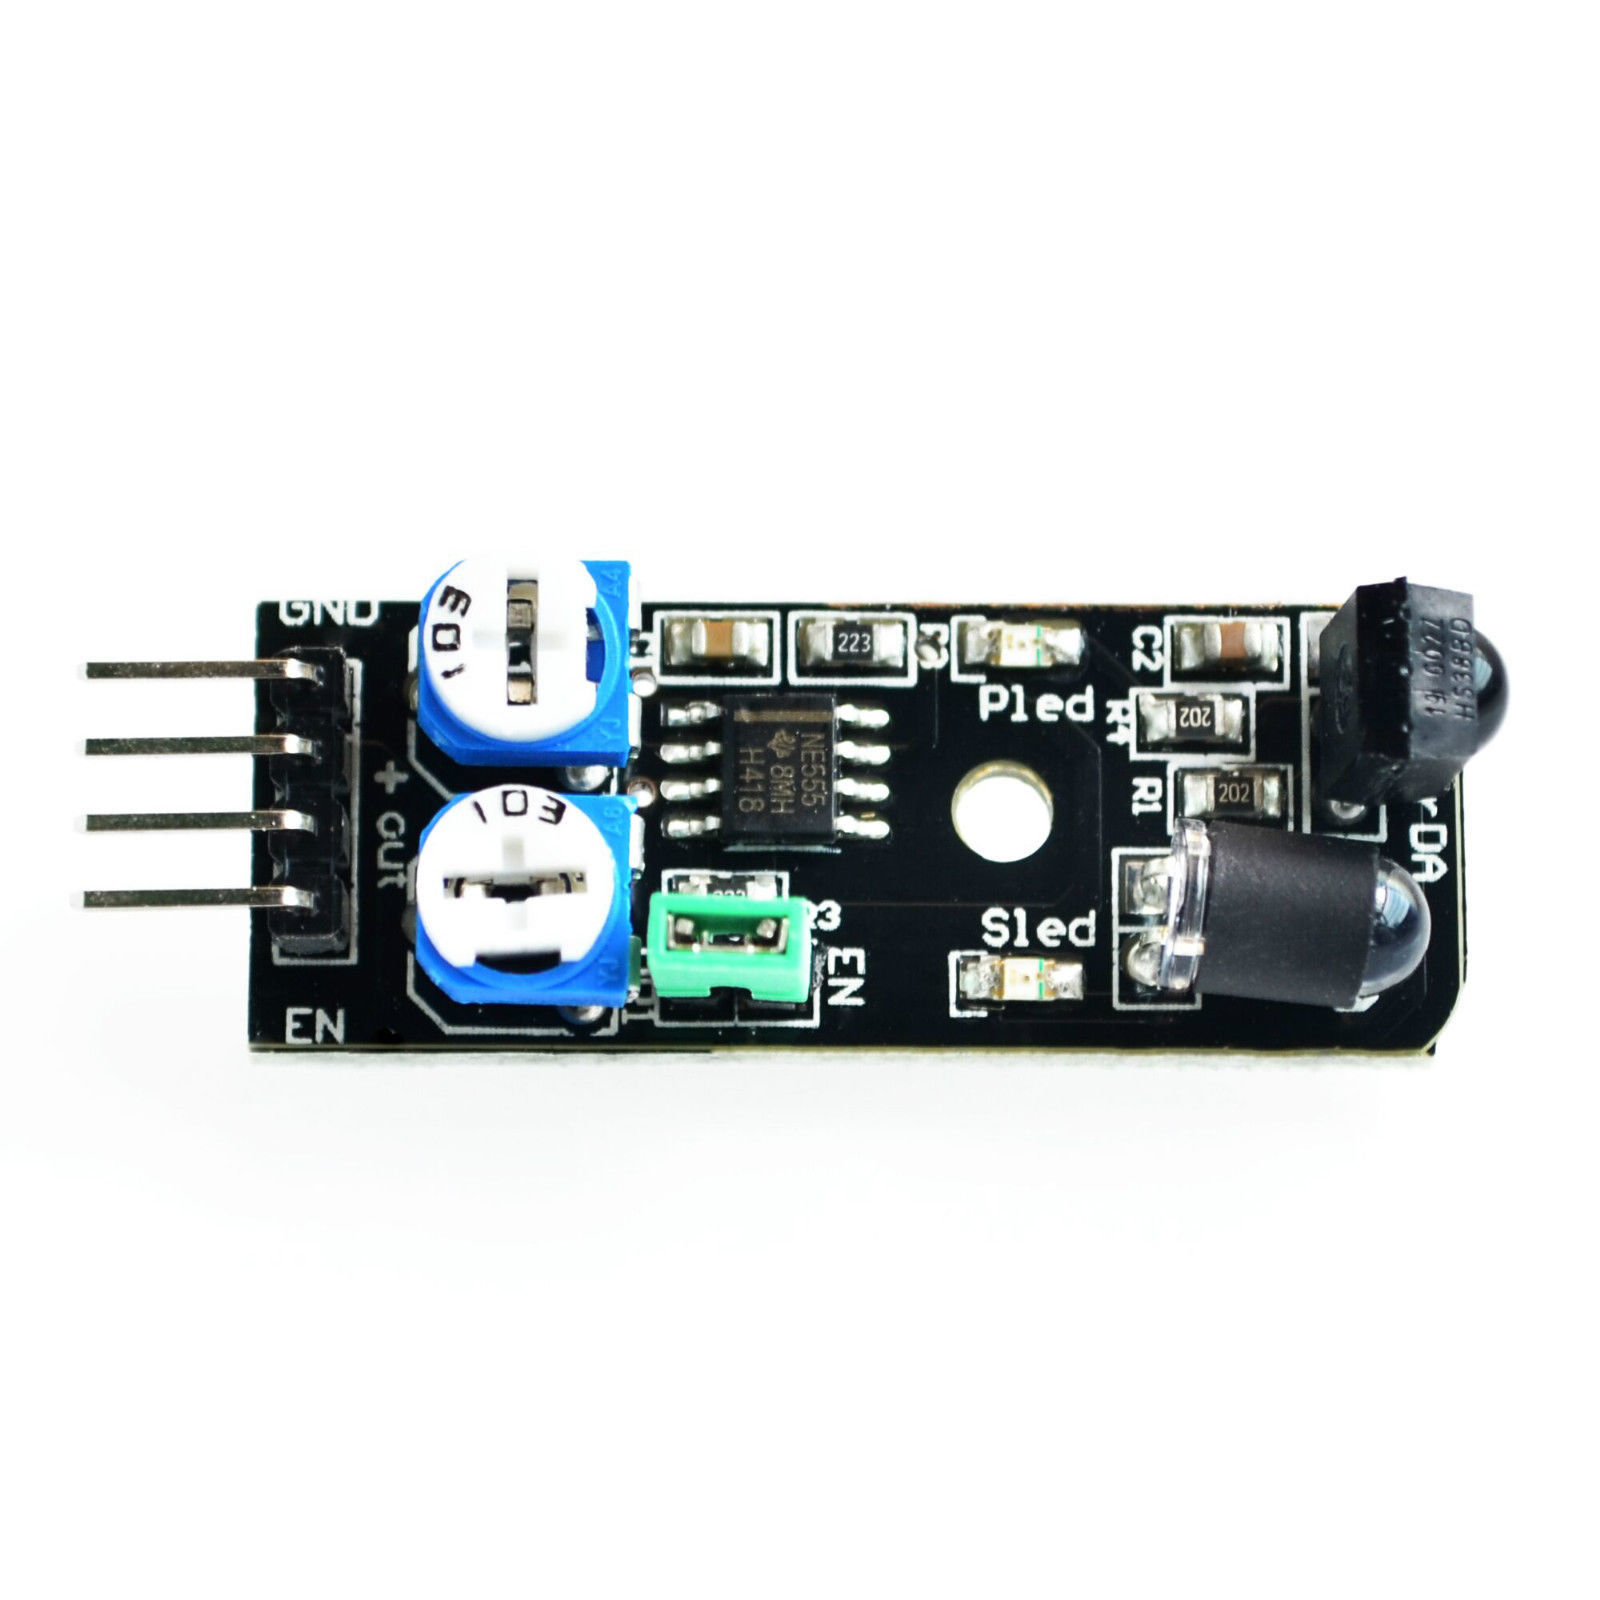 KY-032 4pin IR Infrarot Hindernisvermeidung Sensor Modul für Arduino Diy Smart